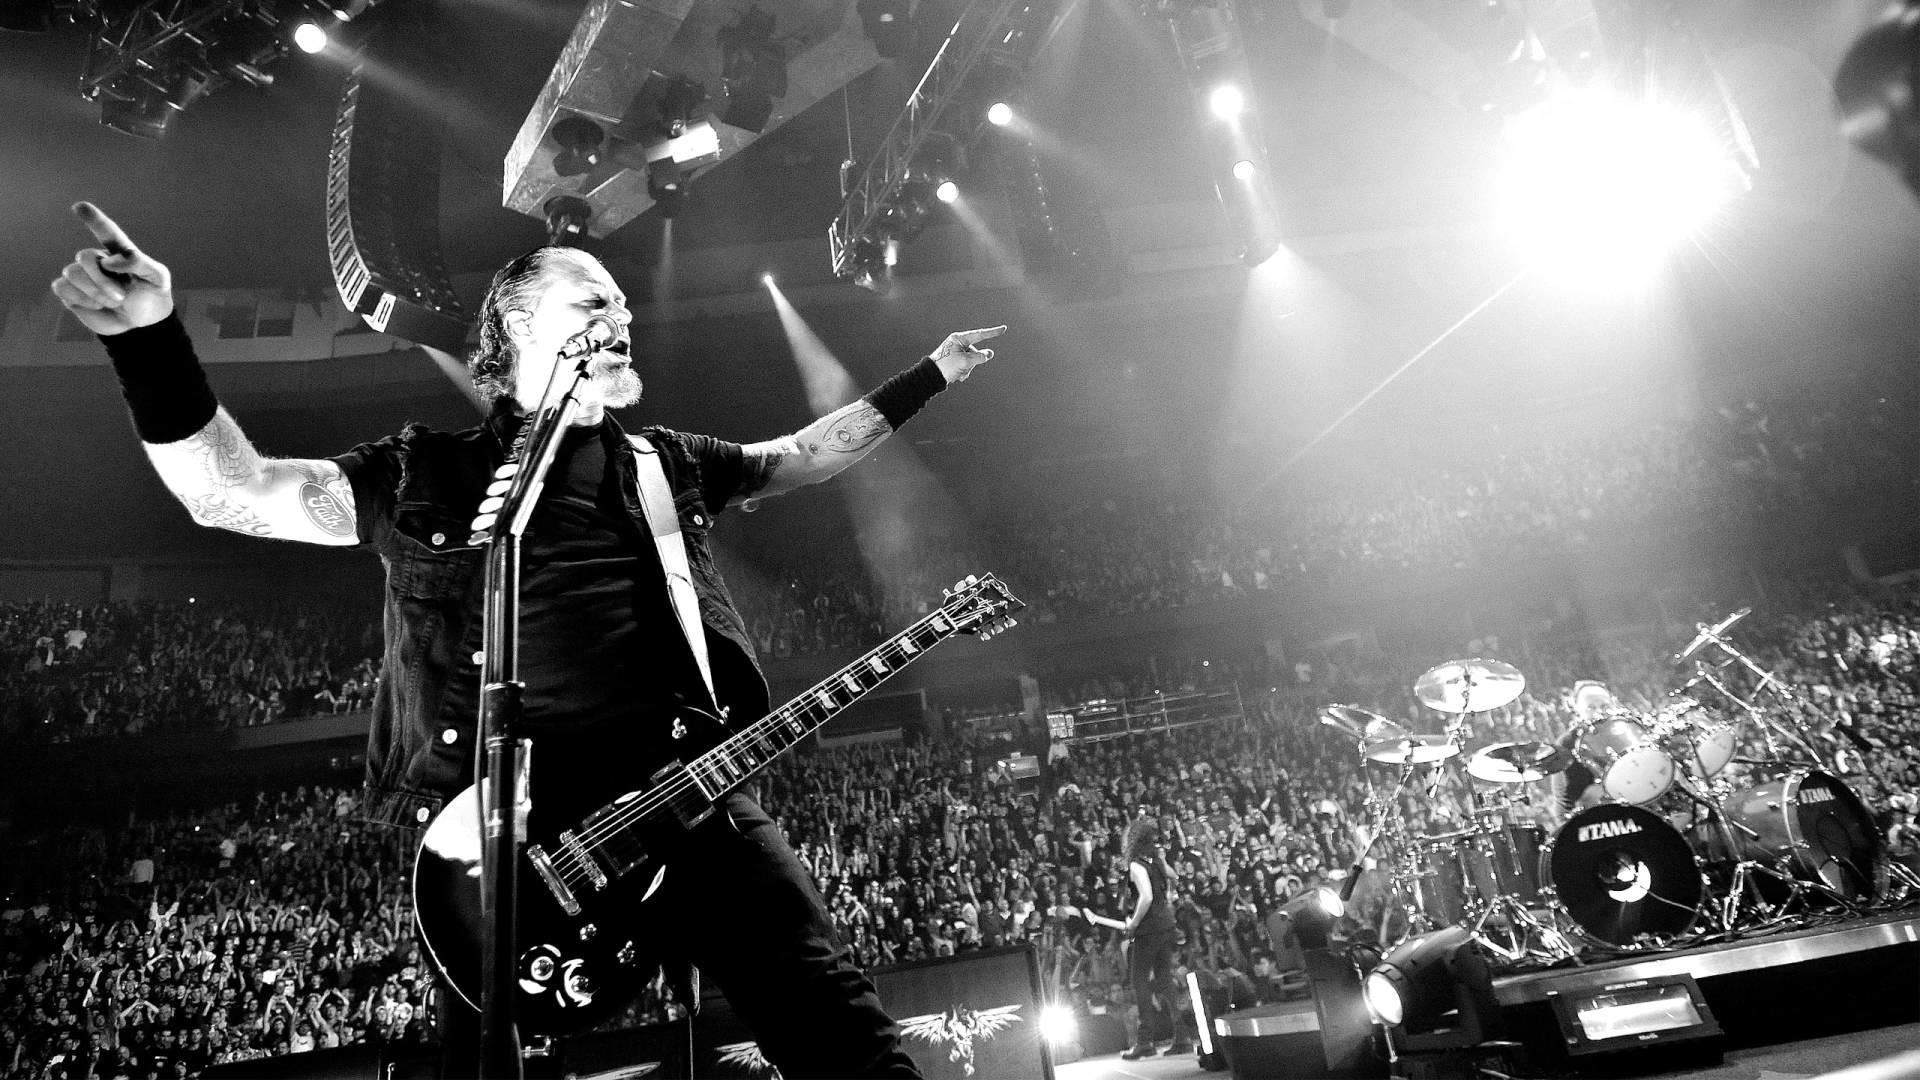 [HQ-FLAC] Metallica – Fade To Black – YouTube